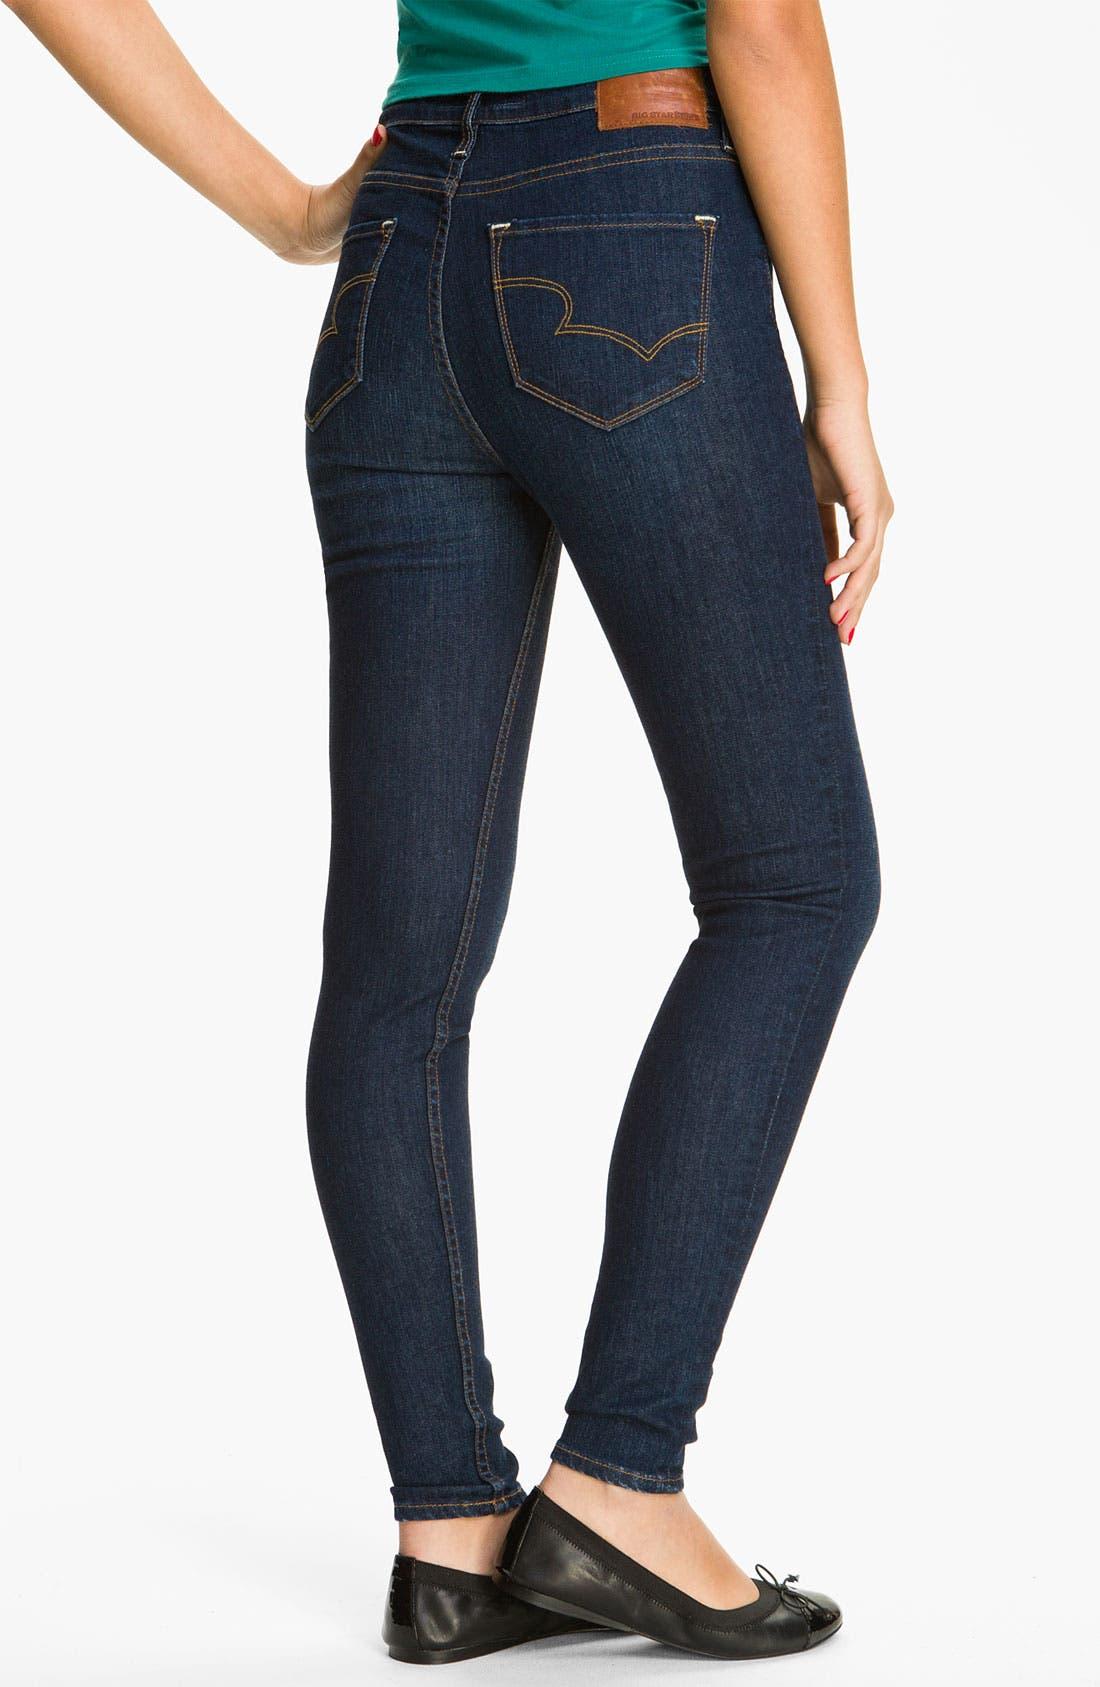 Main Image - Big Star 'Avalon' Skinny Jeans (Flux) (Juniors)